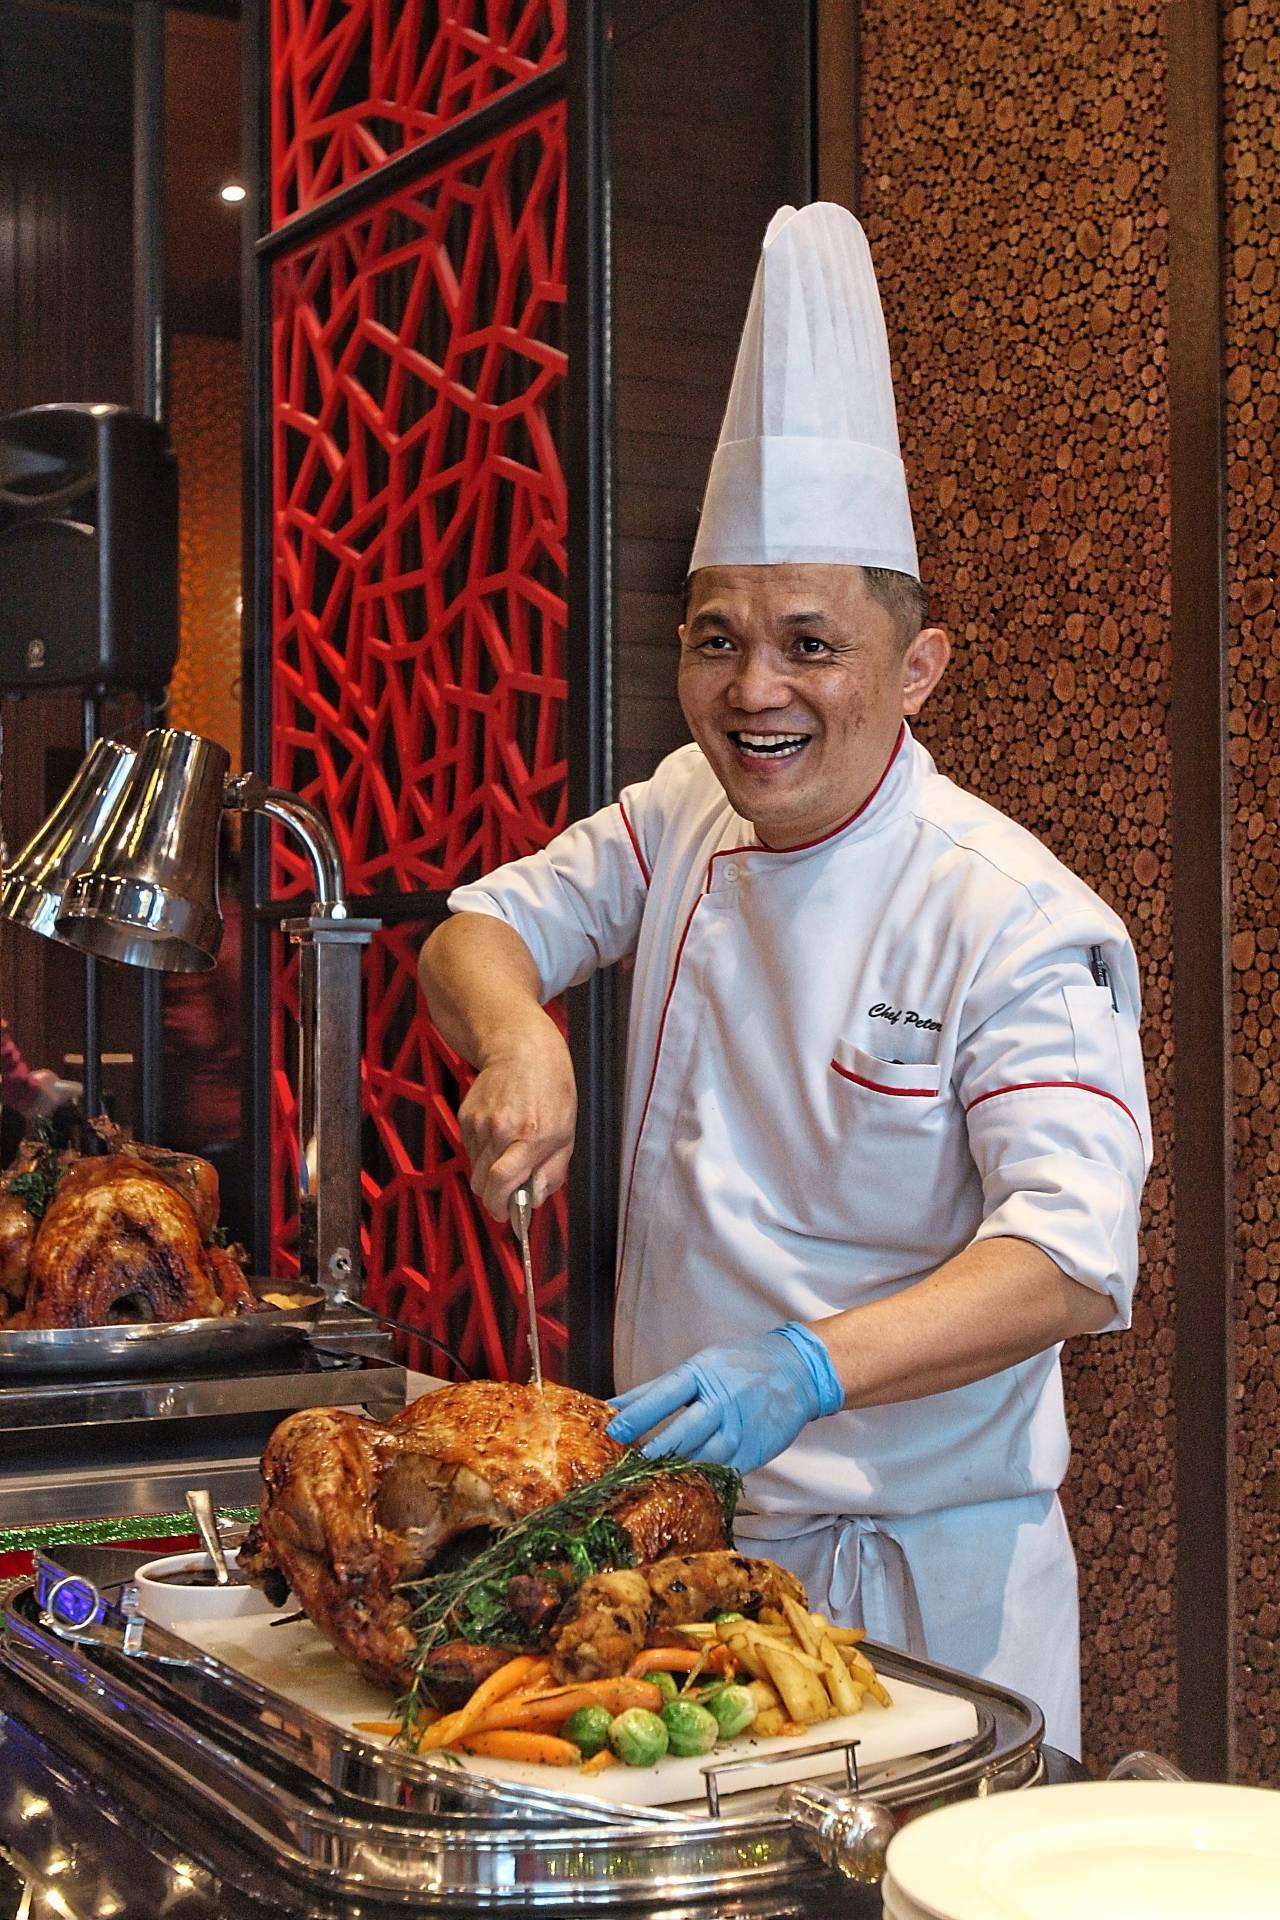 Lee carving up the roast turkey. — Photos: SAM THAM/The Star